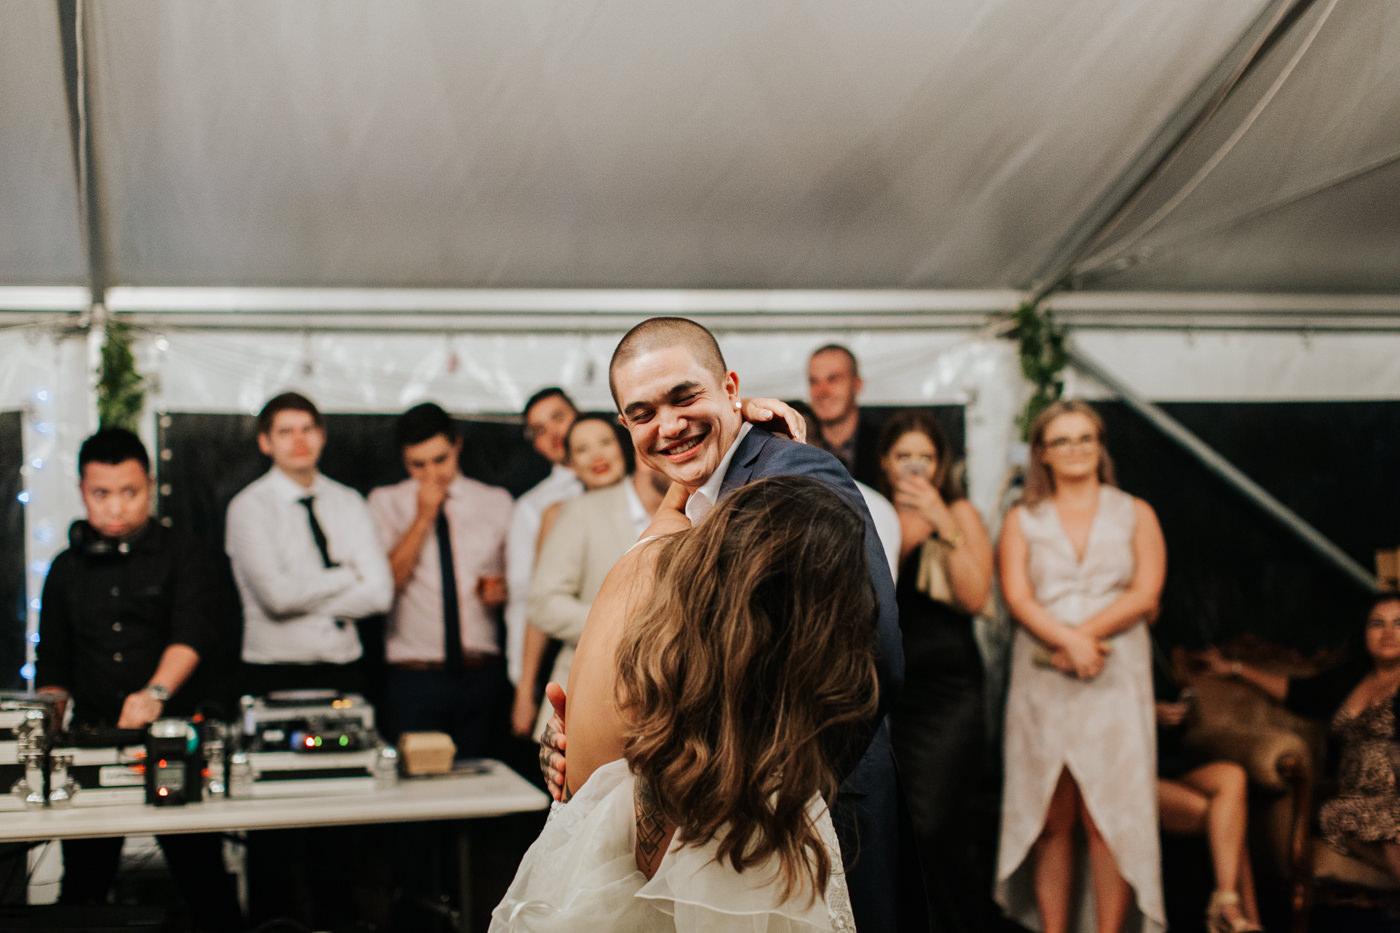 Nick & Vanezza - Fernbank Farm Wedding - Samantha Heather Photography-170.jpg